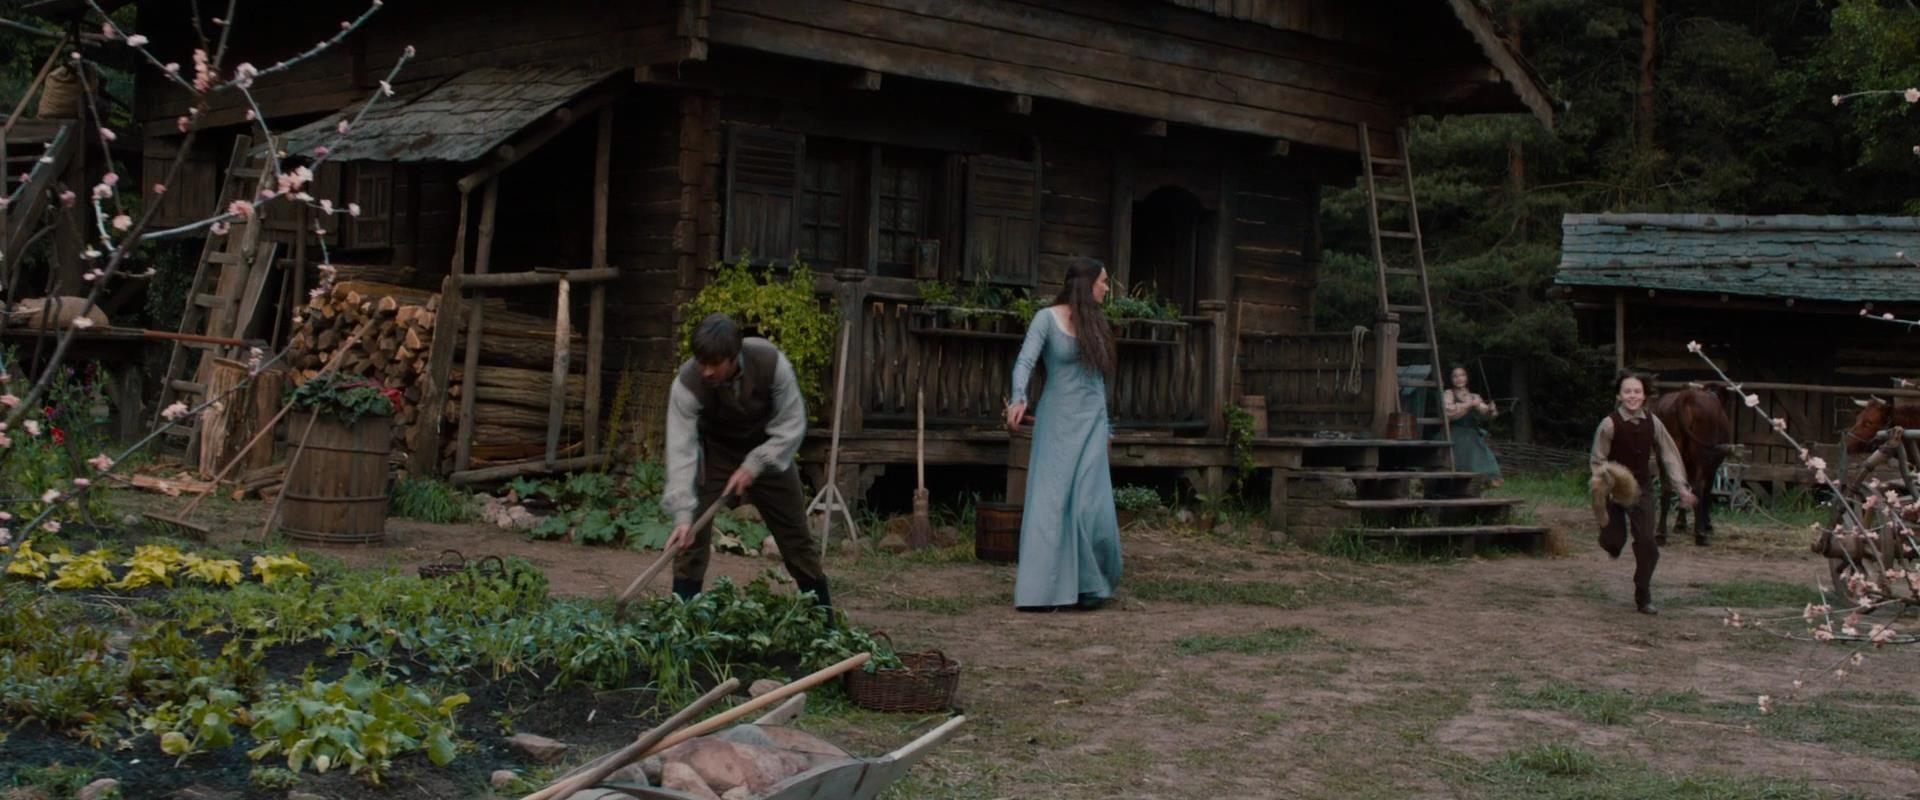 Hansel gretel 39 s home hansel gretel witch hunters wiki - Hansel home ...